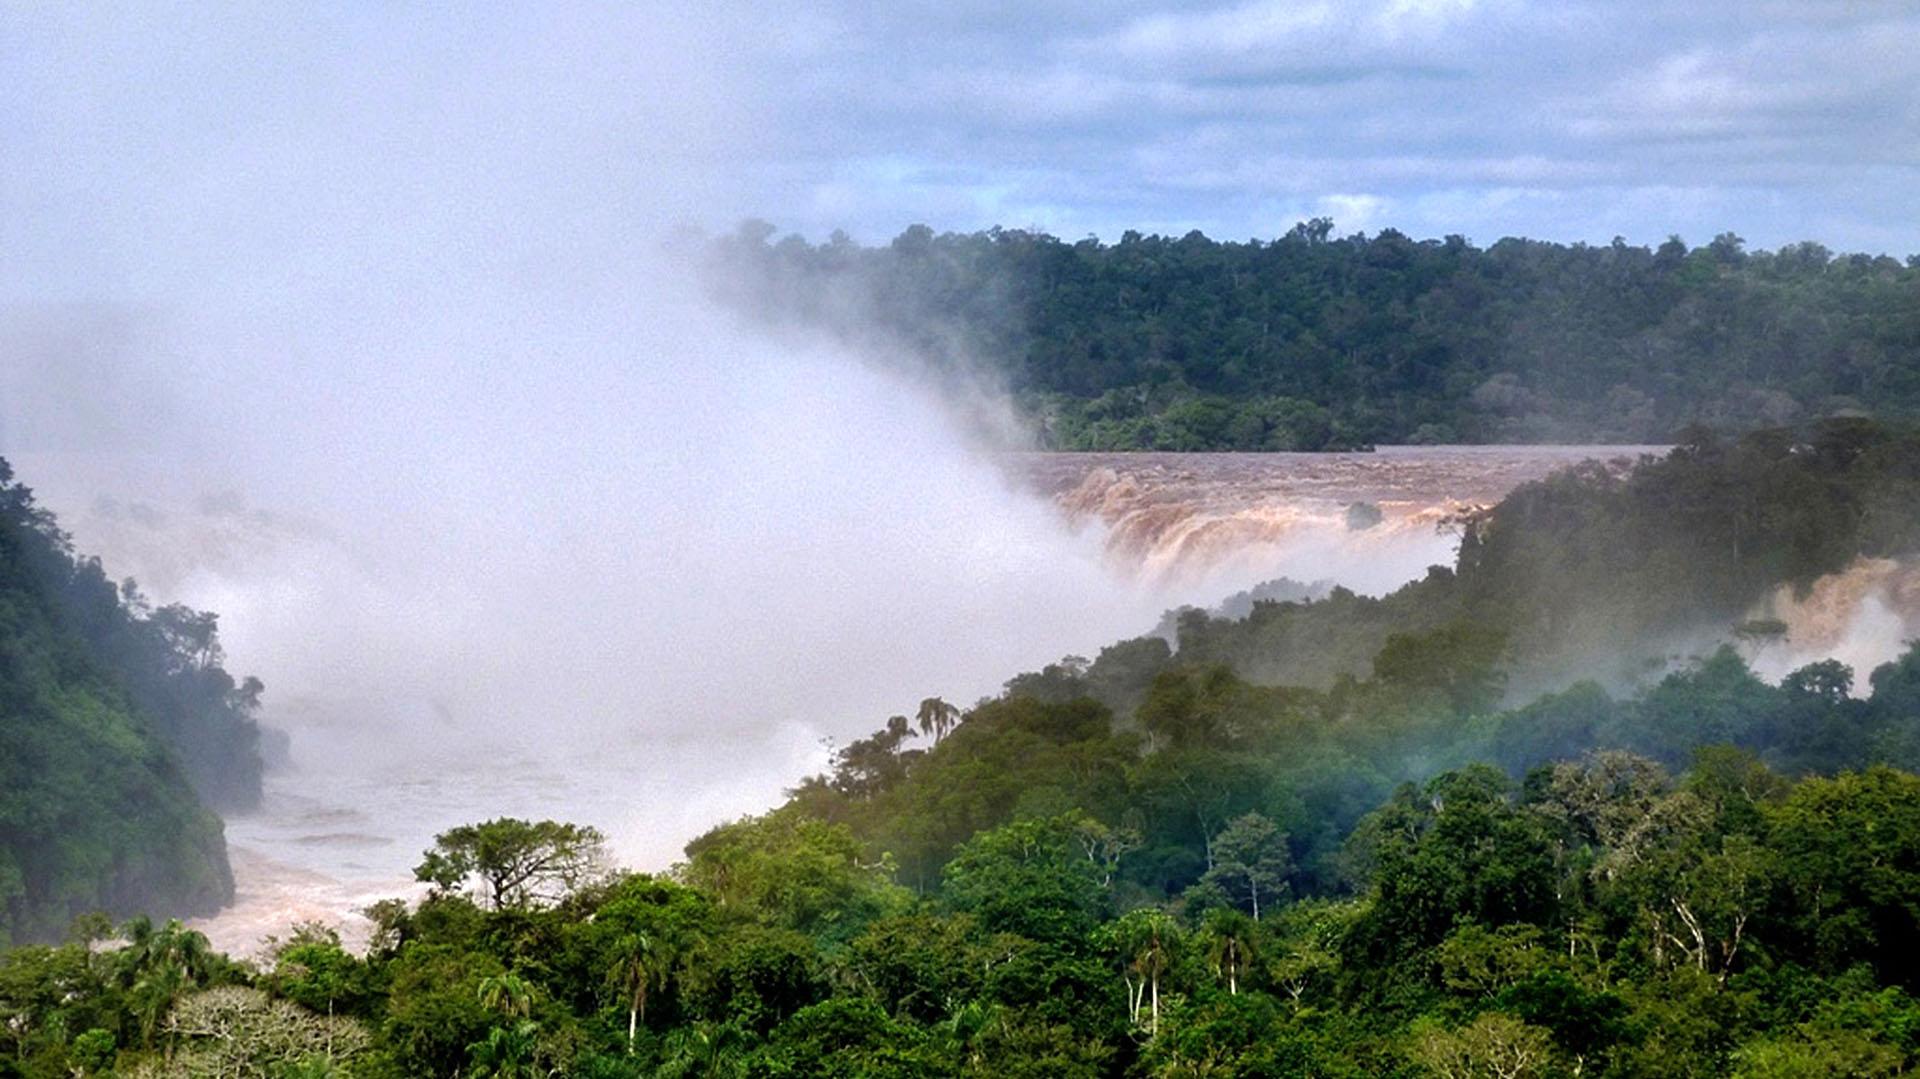 La selva misionera cobija atenta y diversa a las Cataratas del Iguazú (NA)